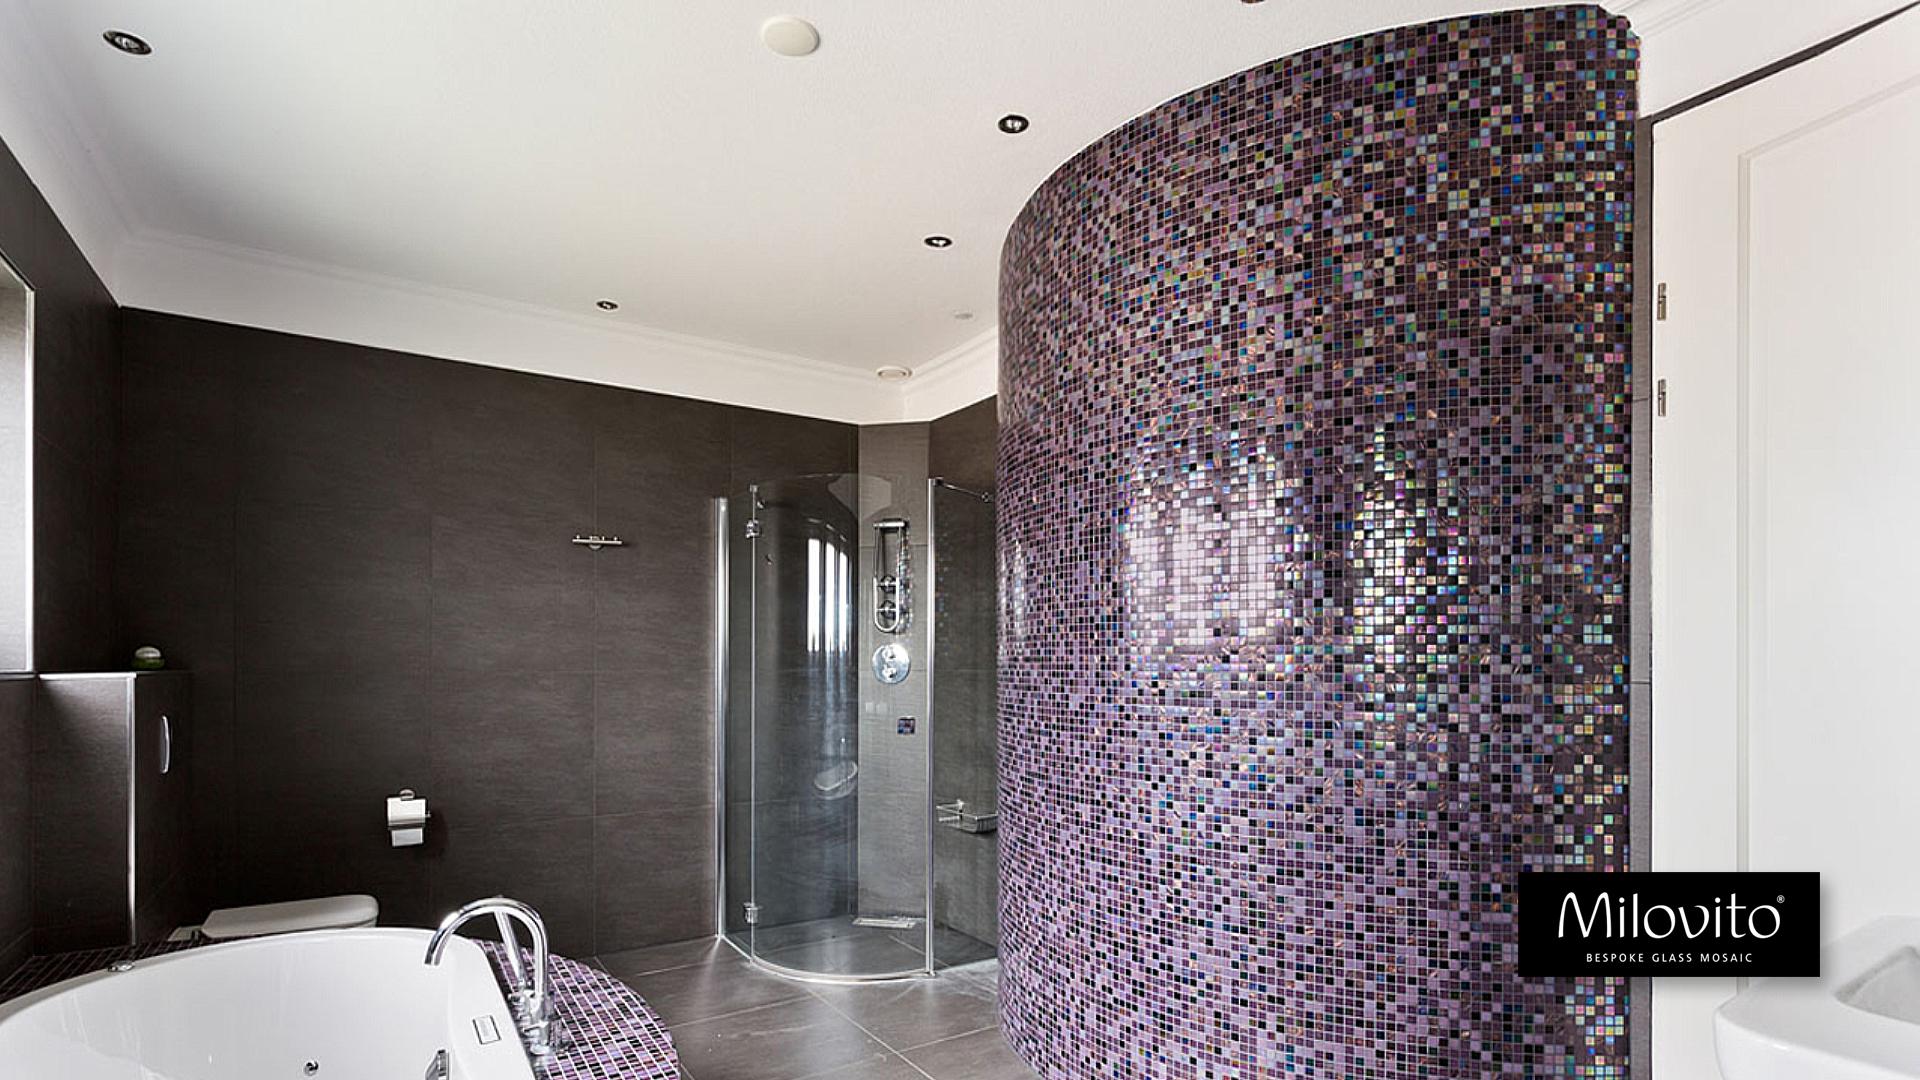 Mozaiek Badkamer Tegels : Unieke badkamers met bespoke glasmozaïek design productie én